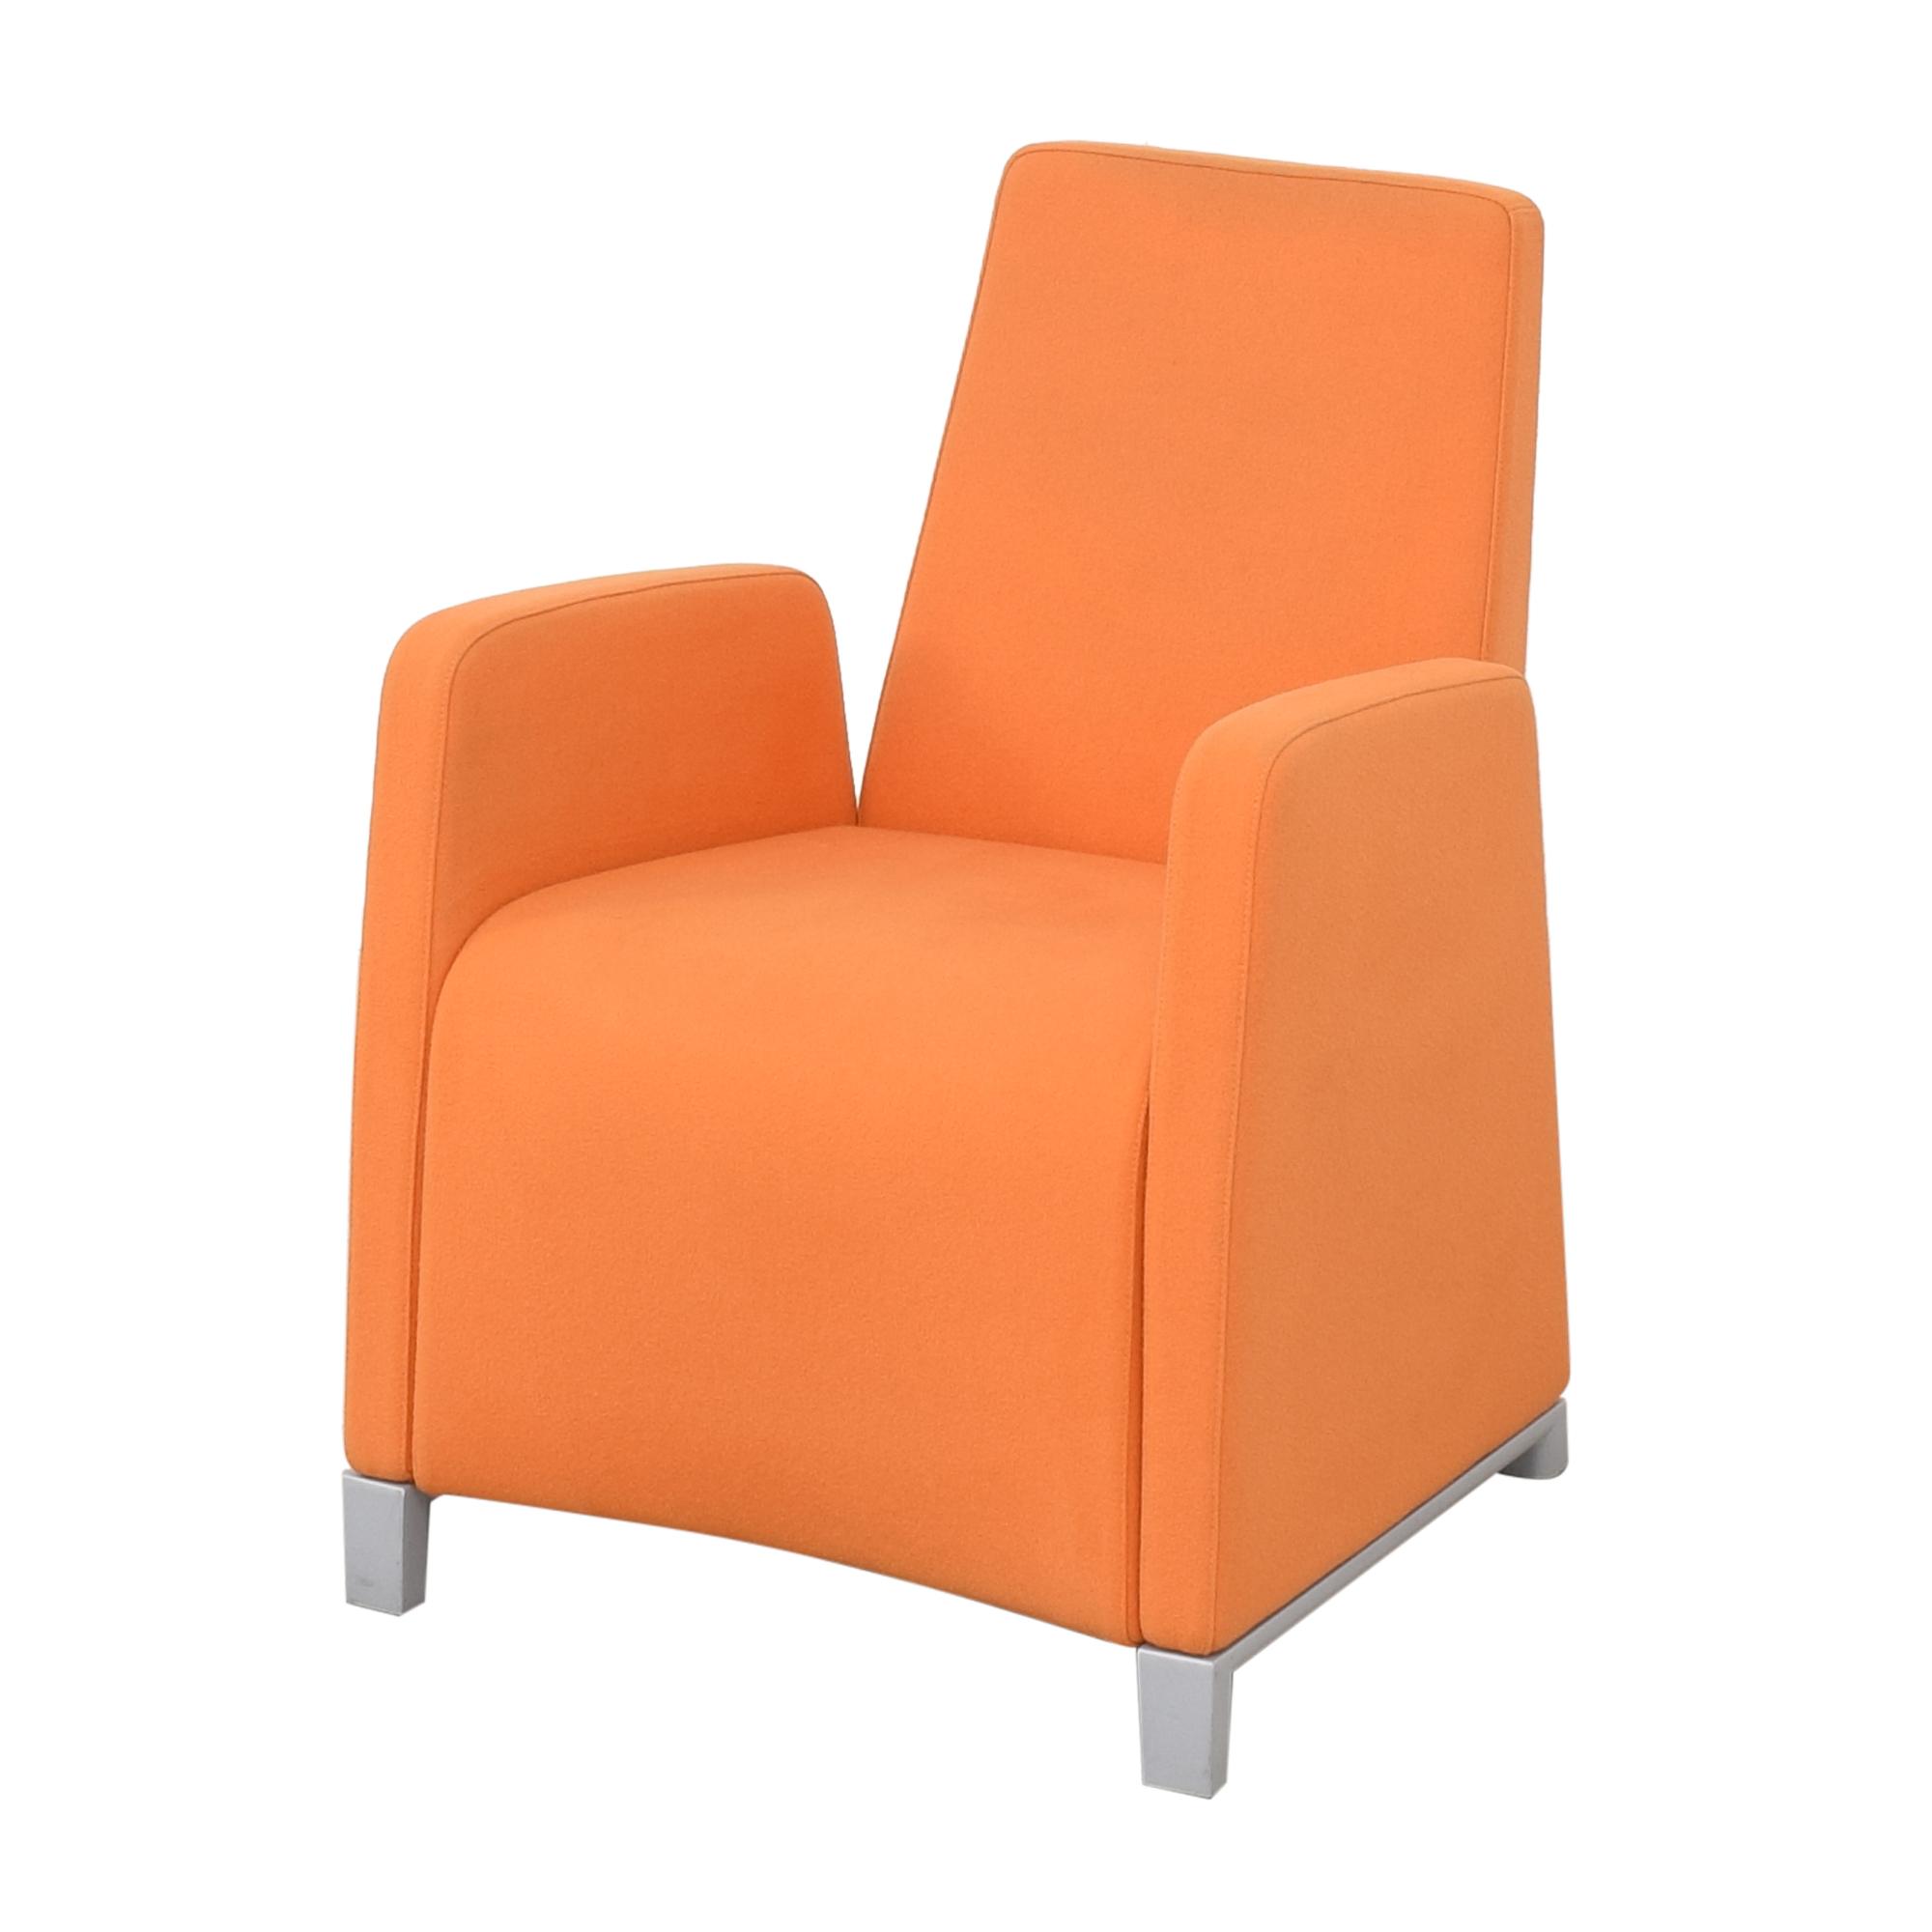 Baleri Italia Baleri Italia Tato Orange Chair second hand